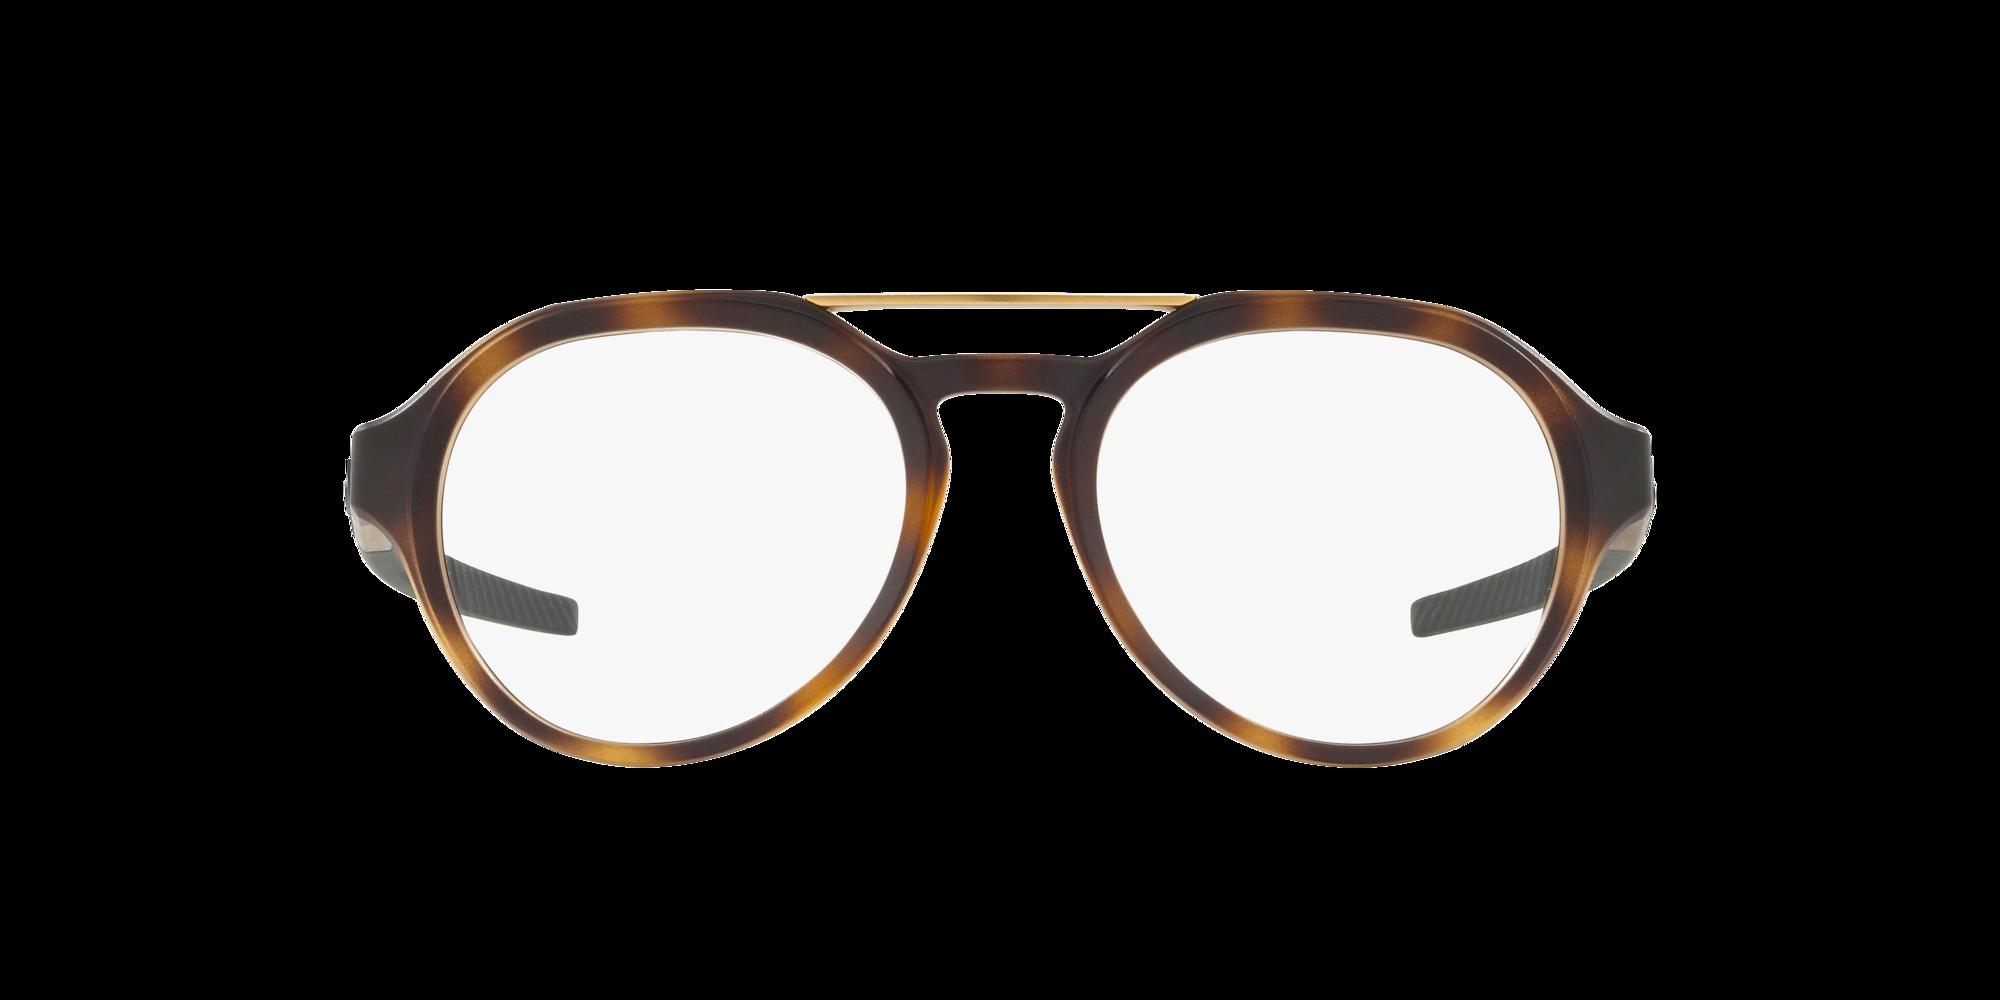 Image for OX8151 SCAVENGER from LensCrafters | Glasses, Prescription Glasses Online, Eyewear